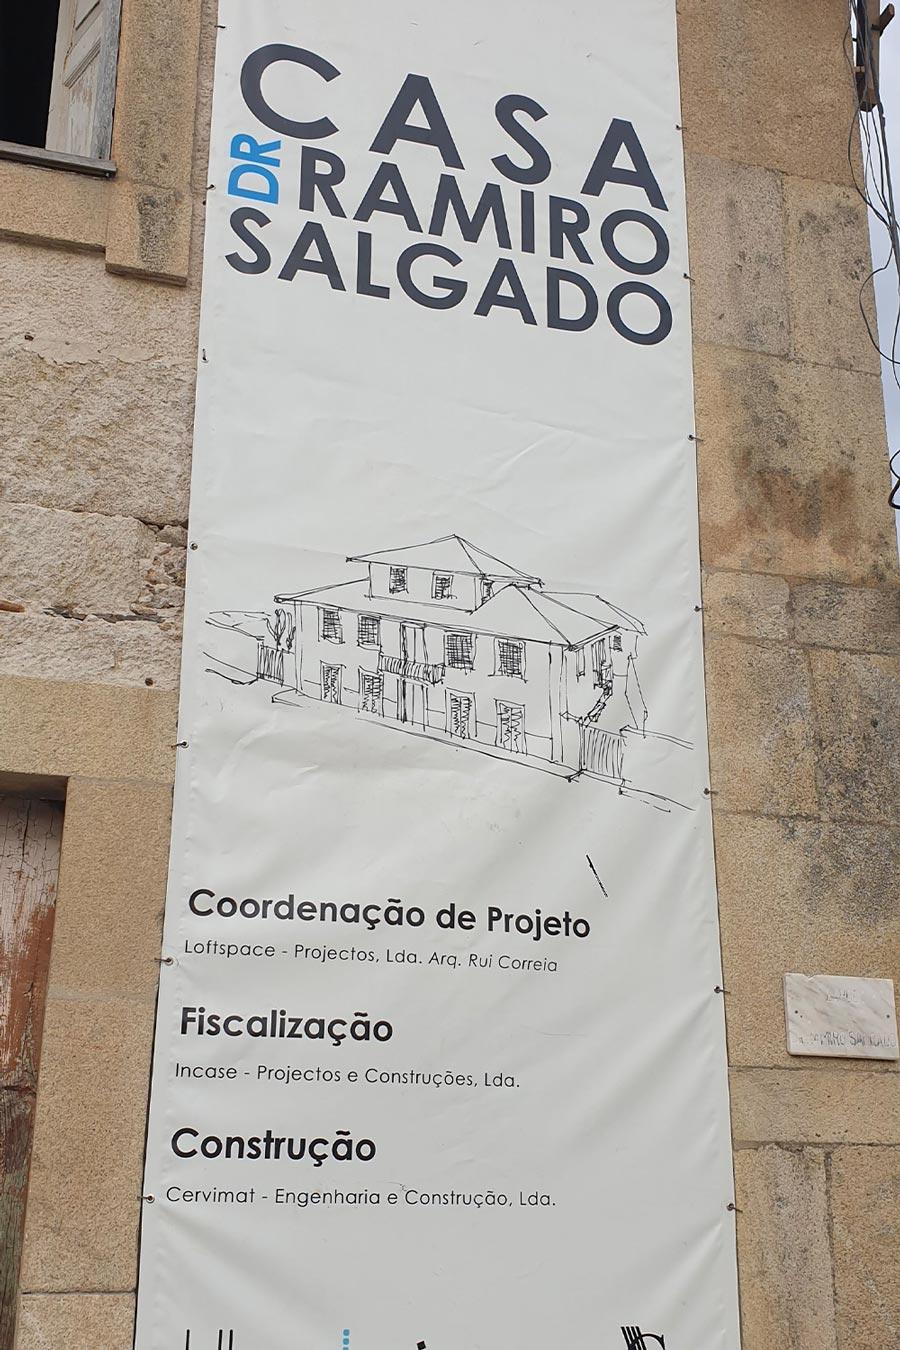 CASA-DR-RAMIRO-SALGADO-2